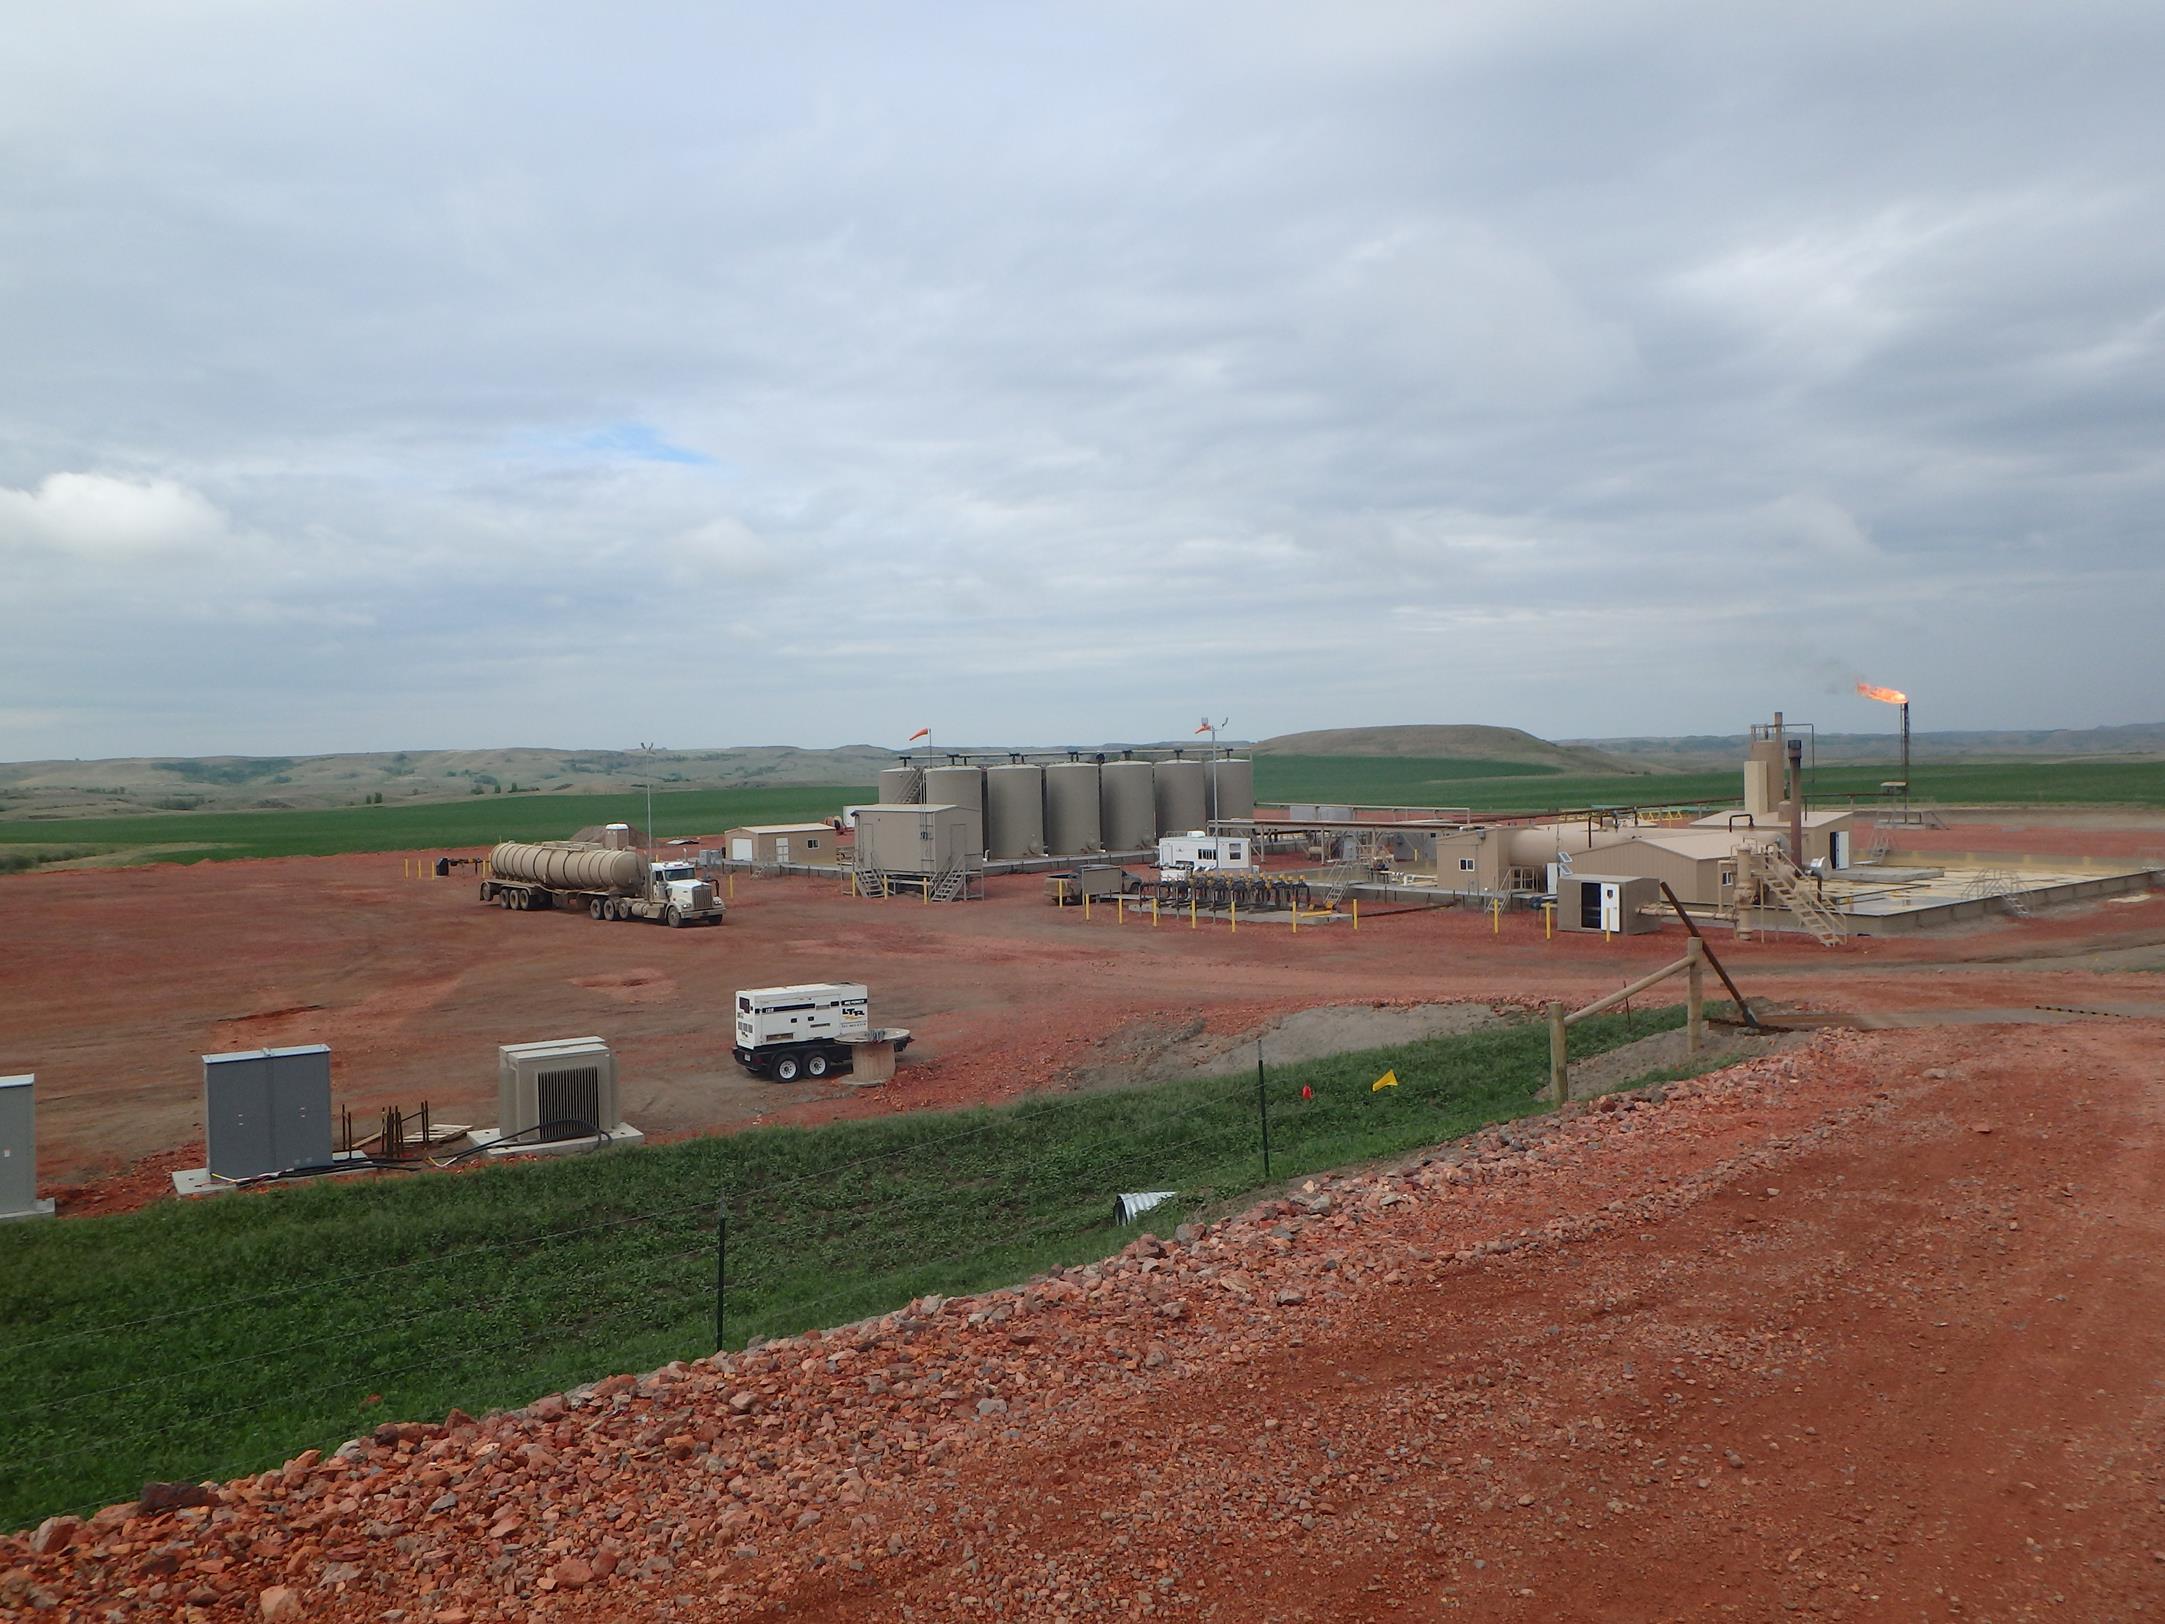 SPCC site inspection area